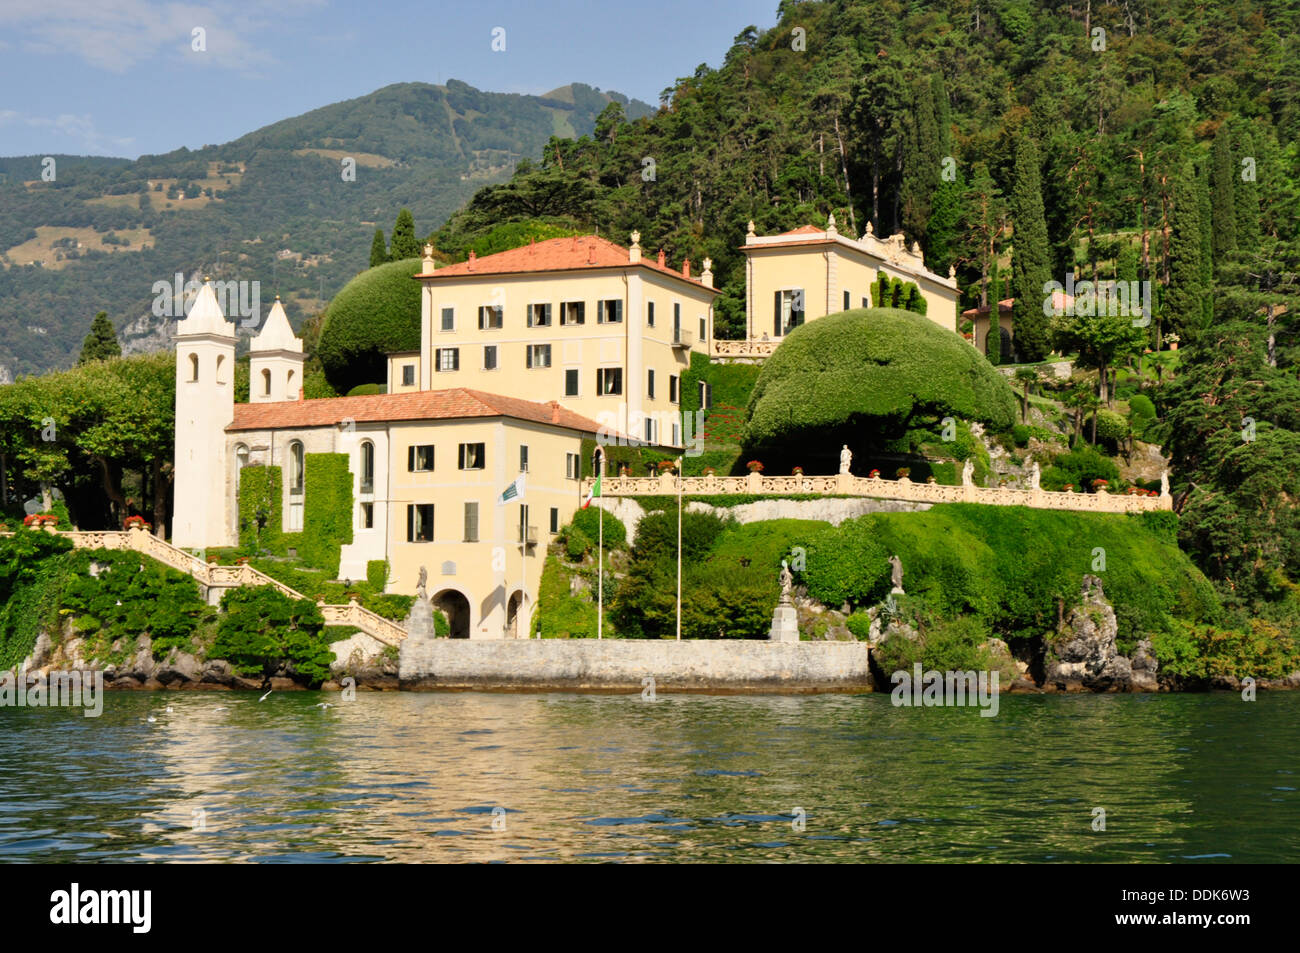 Italy - Lake Como - Lenno - Villa del Balbianello - seen from the lake - built into  slopes of the Punta del Lavedo peninsula. Stock Photo